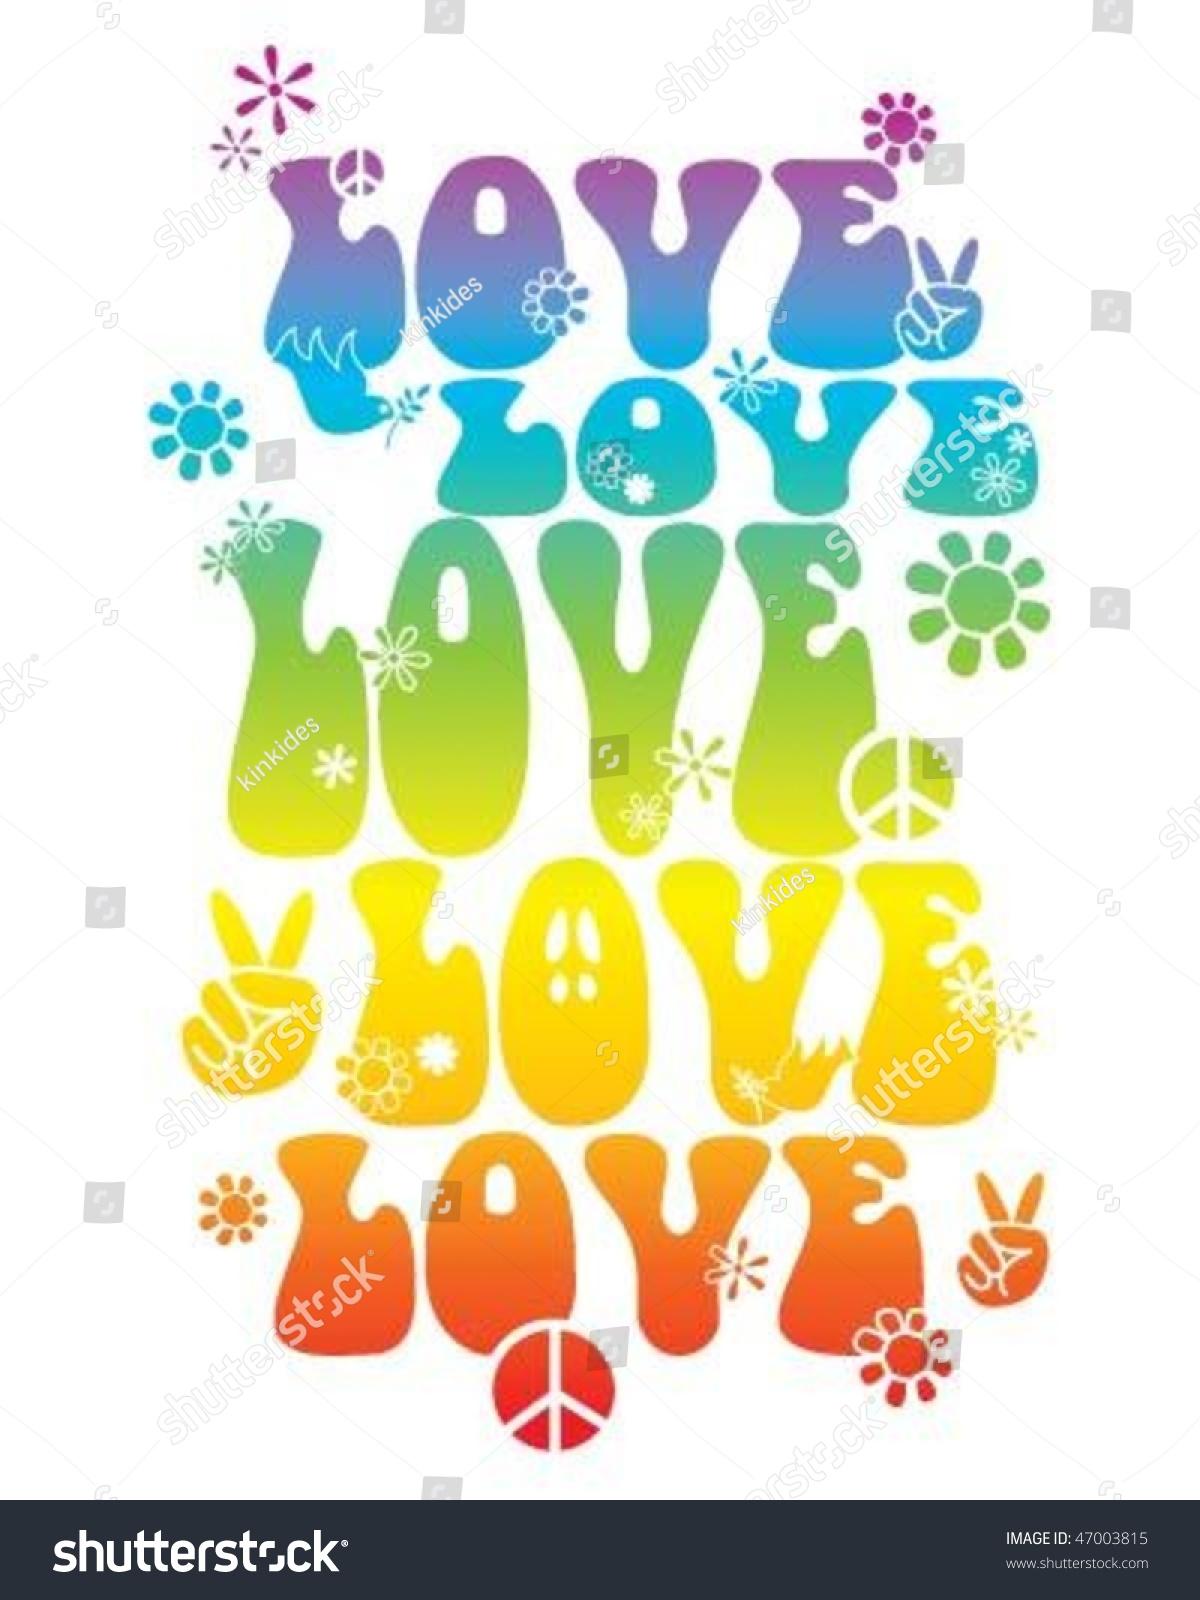 Shirt design style - Love Hippie Style T Shirt Design